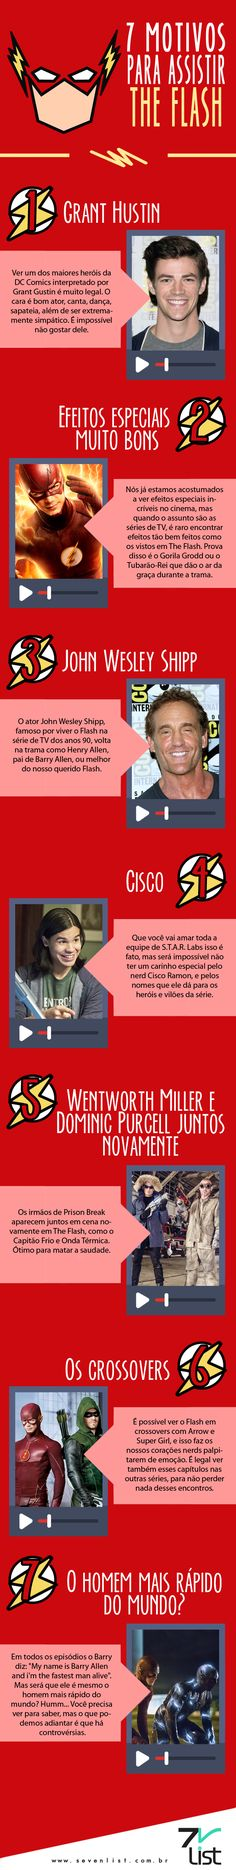 #Sevenlist #Infográfico #Infographic #List #Lista #Illustration #TVShow #Movie #Film #Cine #Seriado #Série #Quadrinho #HQ #Herói #Hero #SuperHerói #SuperHero #Flash #TheFlash #OHomemMaisRápidodoMundo #GrantHustin #EfeitosEspeciais #JohnWesleyShipp #CiscoRamon #Wentworth MillereDominic Purcell #Crossovers